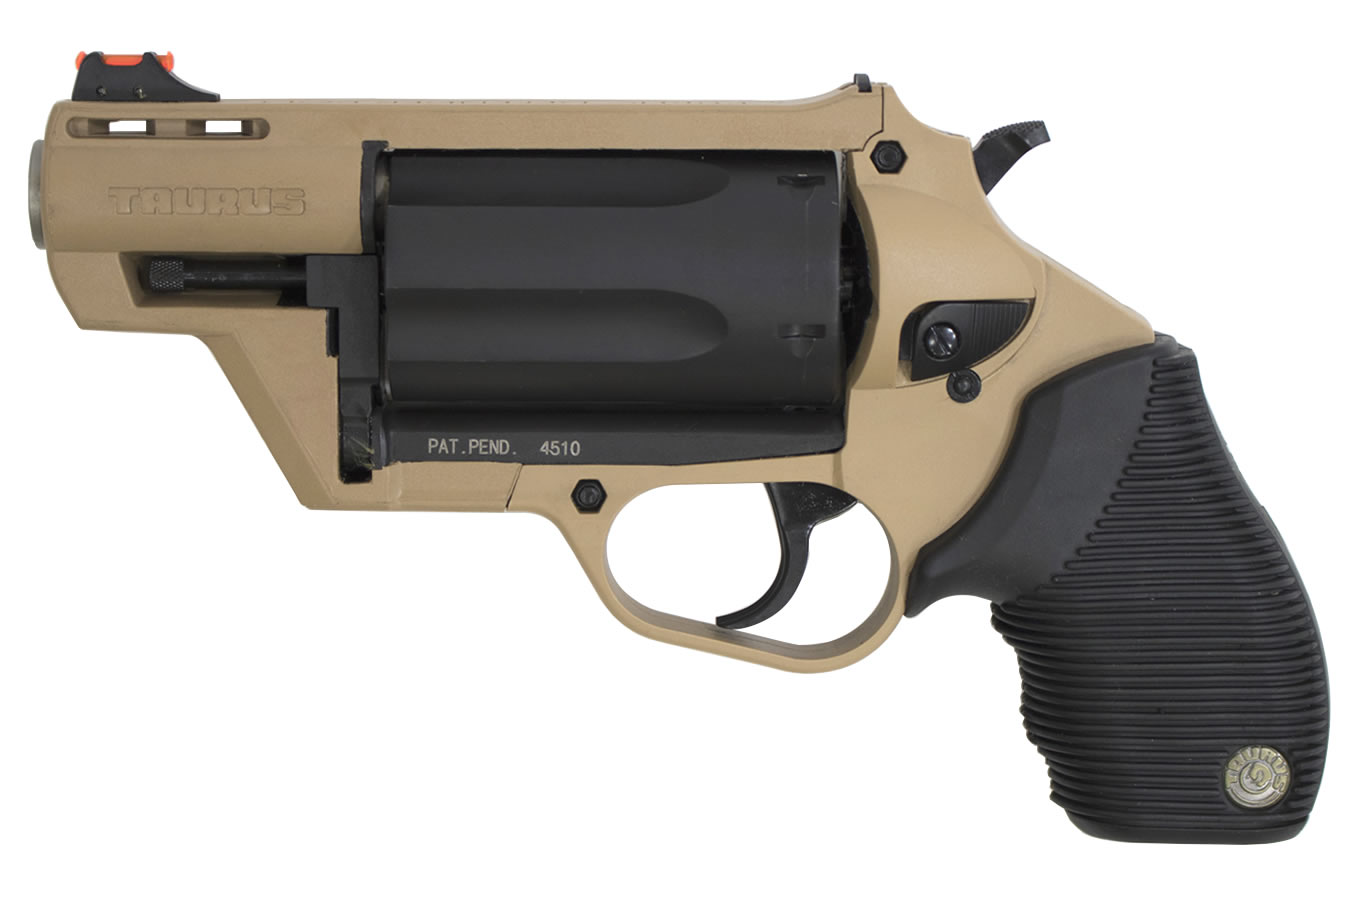 Taurus Judge Public Defender Poly 45/410 Flat Dark Earth Polymer Frame  Revolver | Sportsman's Outdoor Superstore